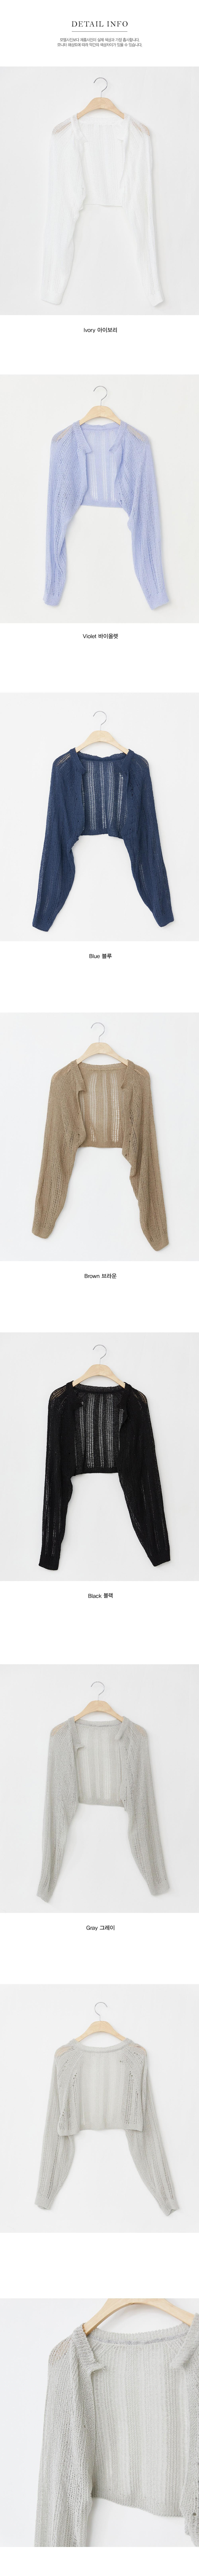 Mango Knitwear Bolero Cardigan